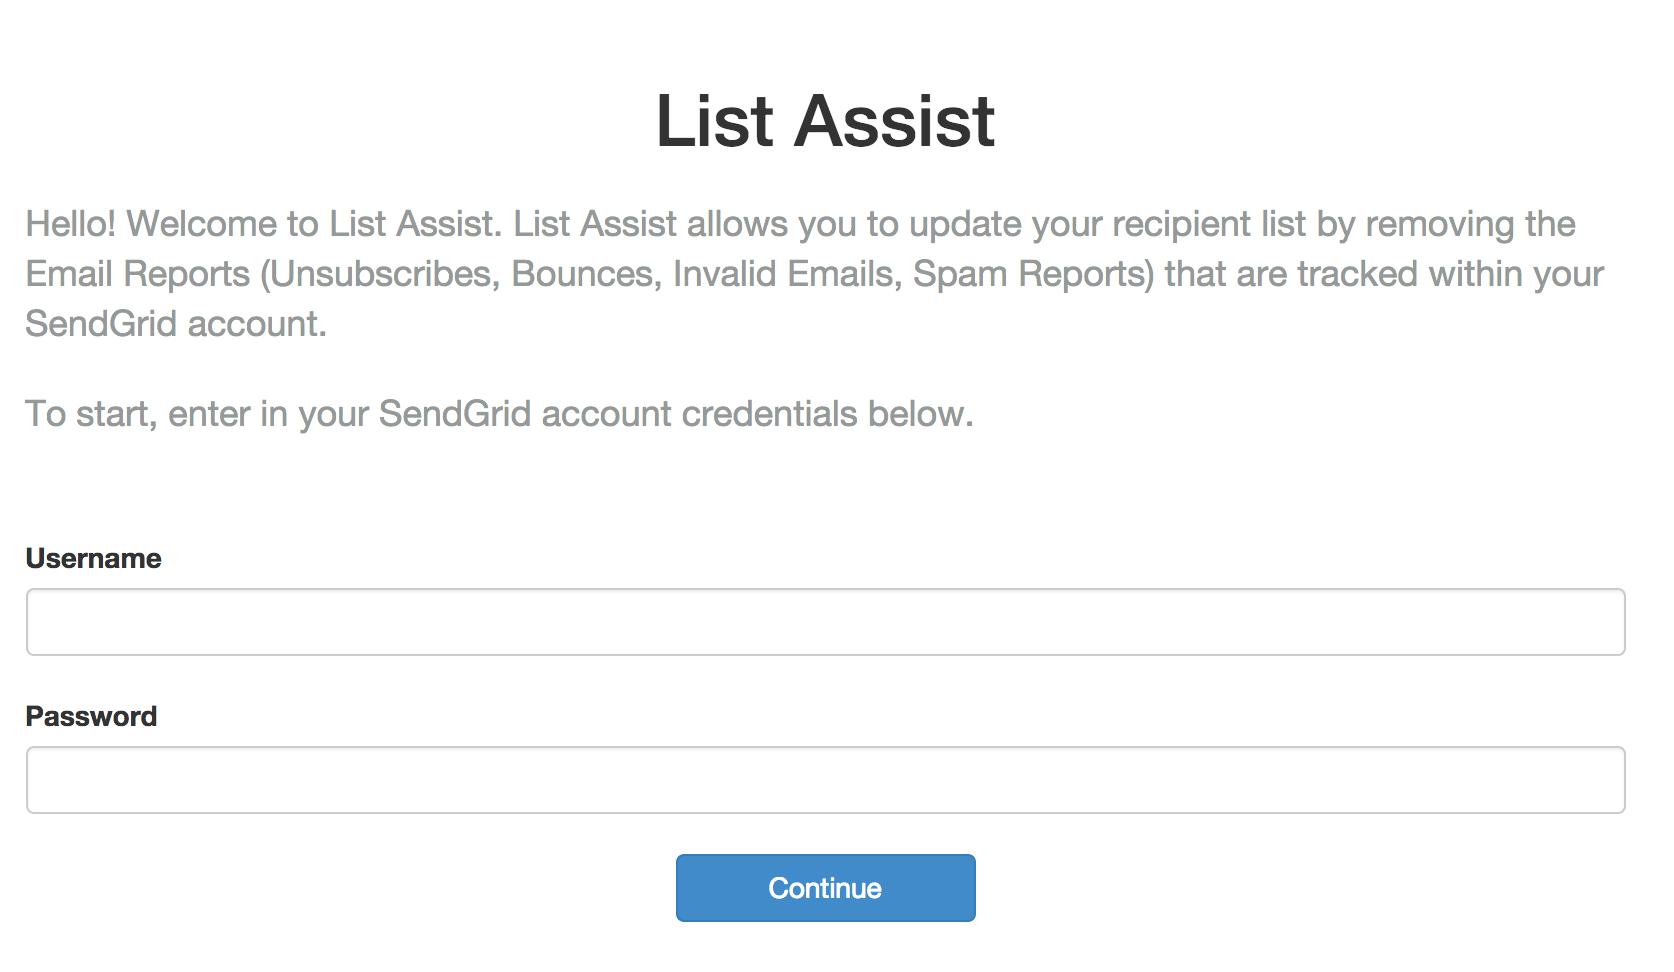 List Assist